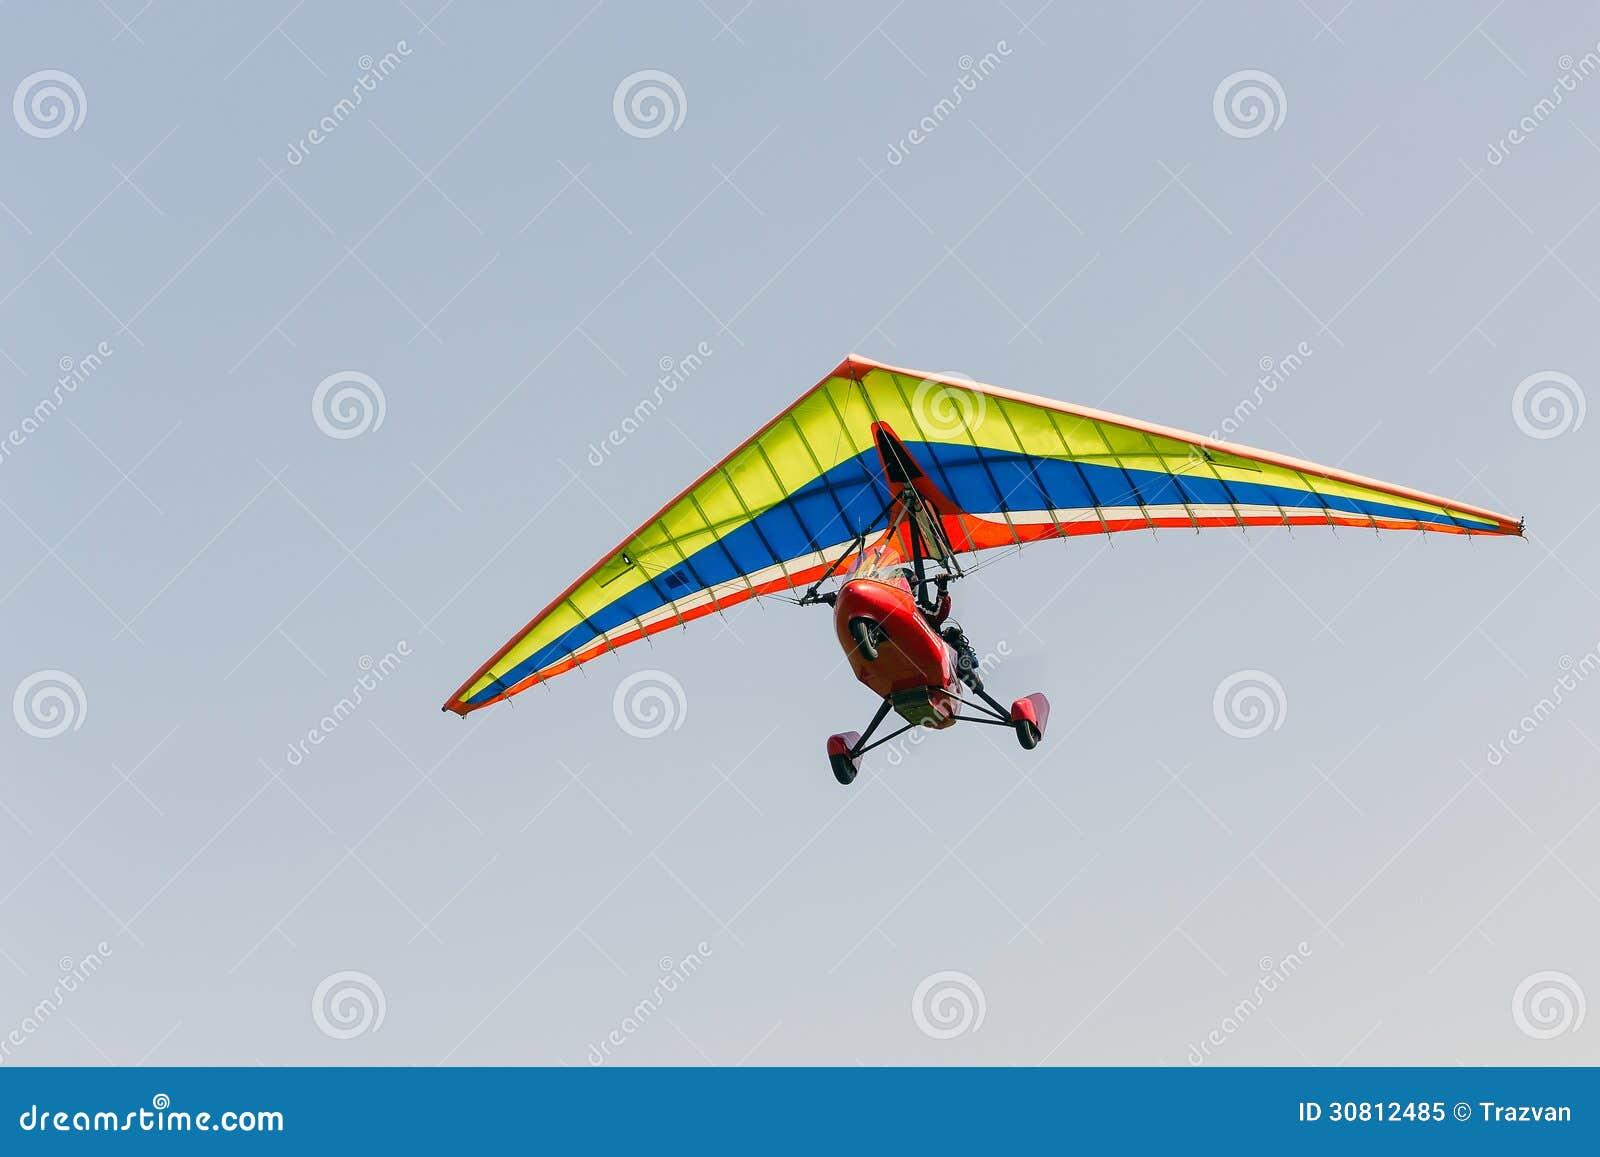 Glider Royalty Free Stock Photo Image 30812485